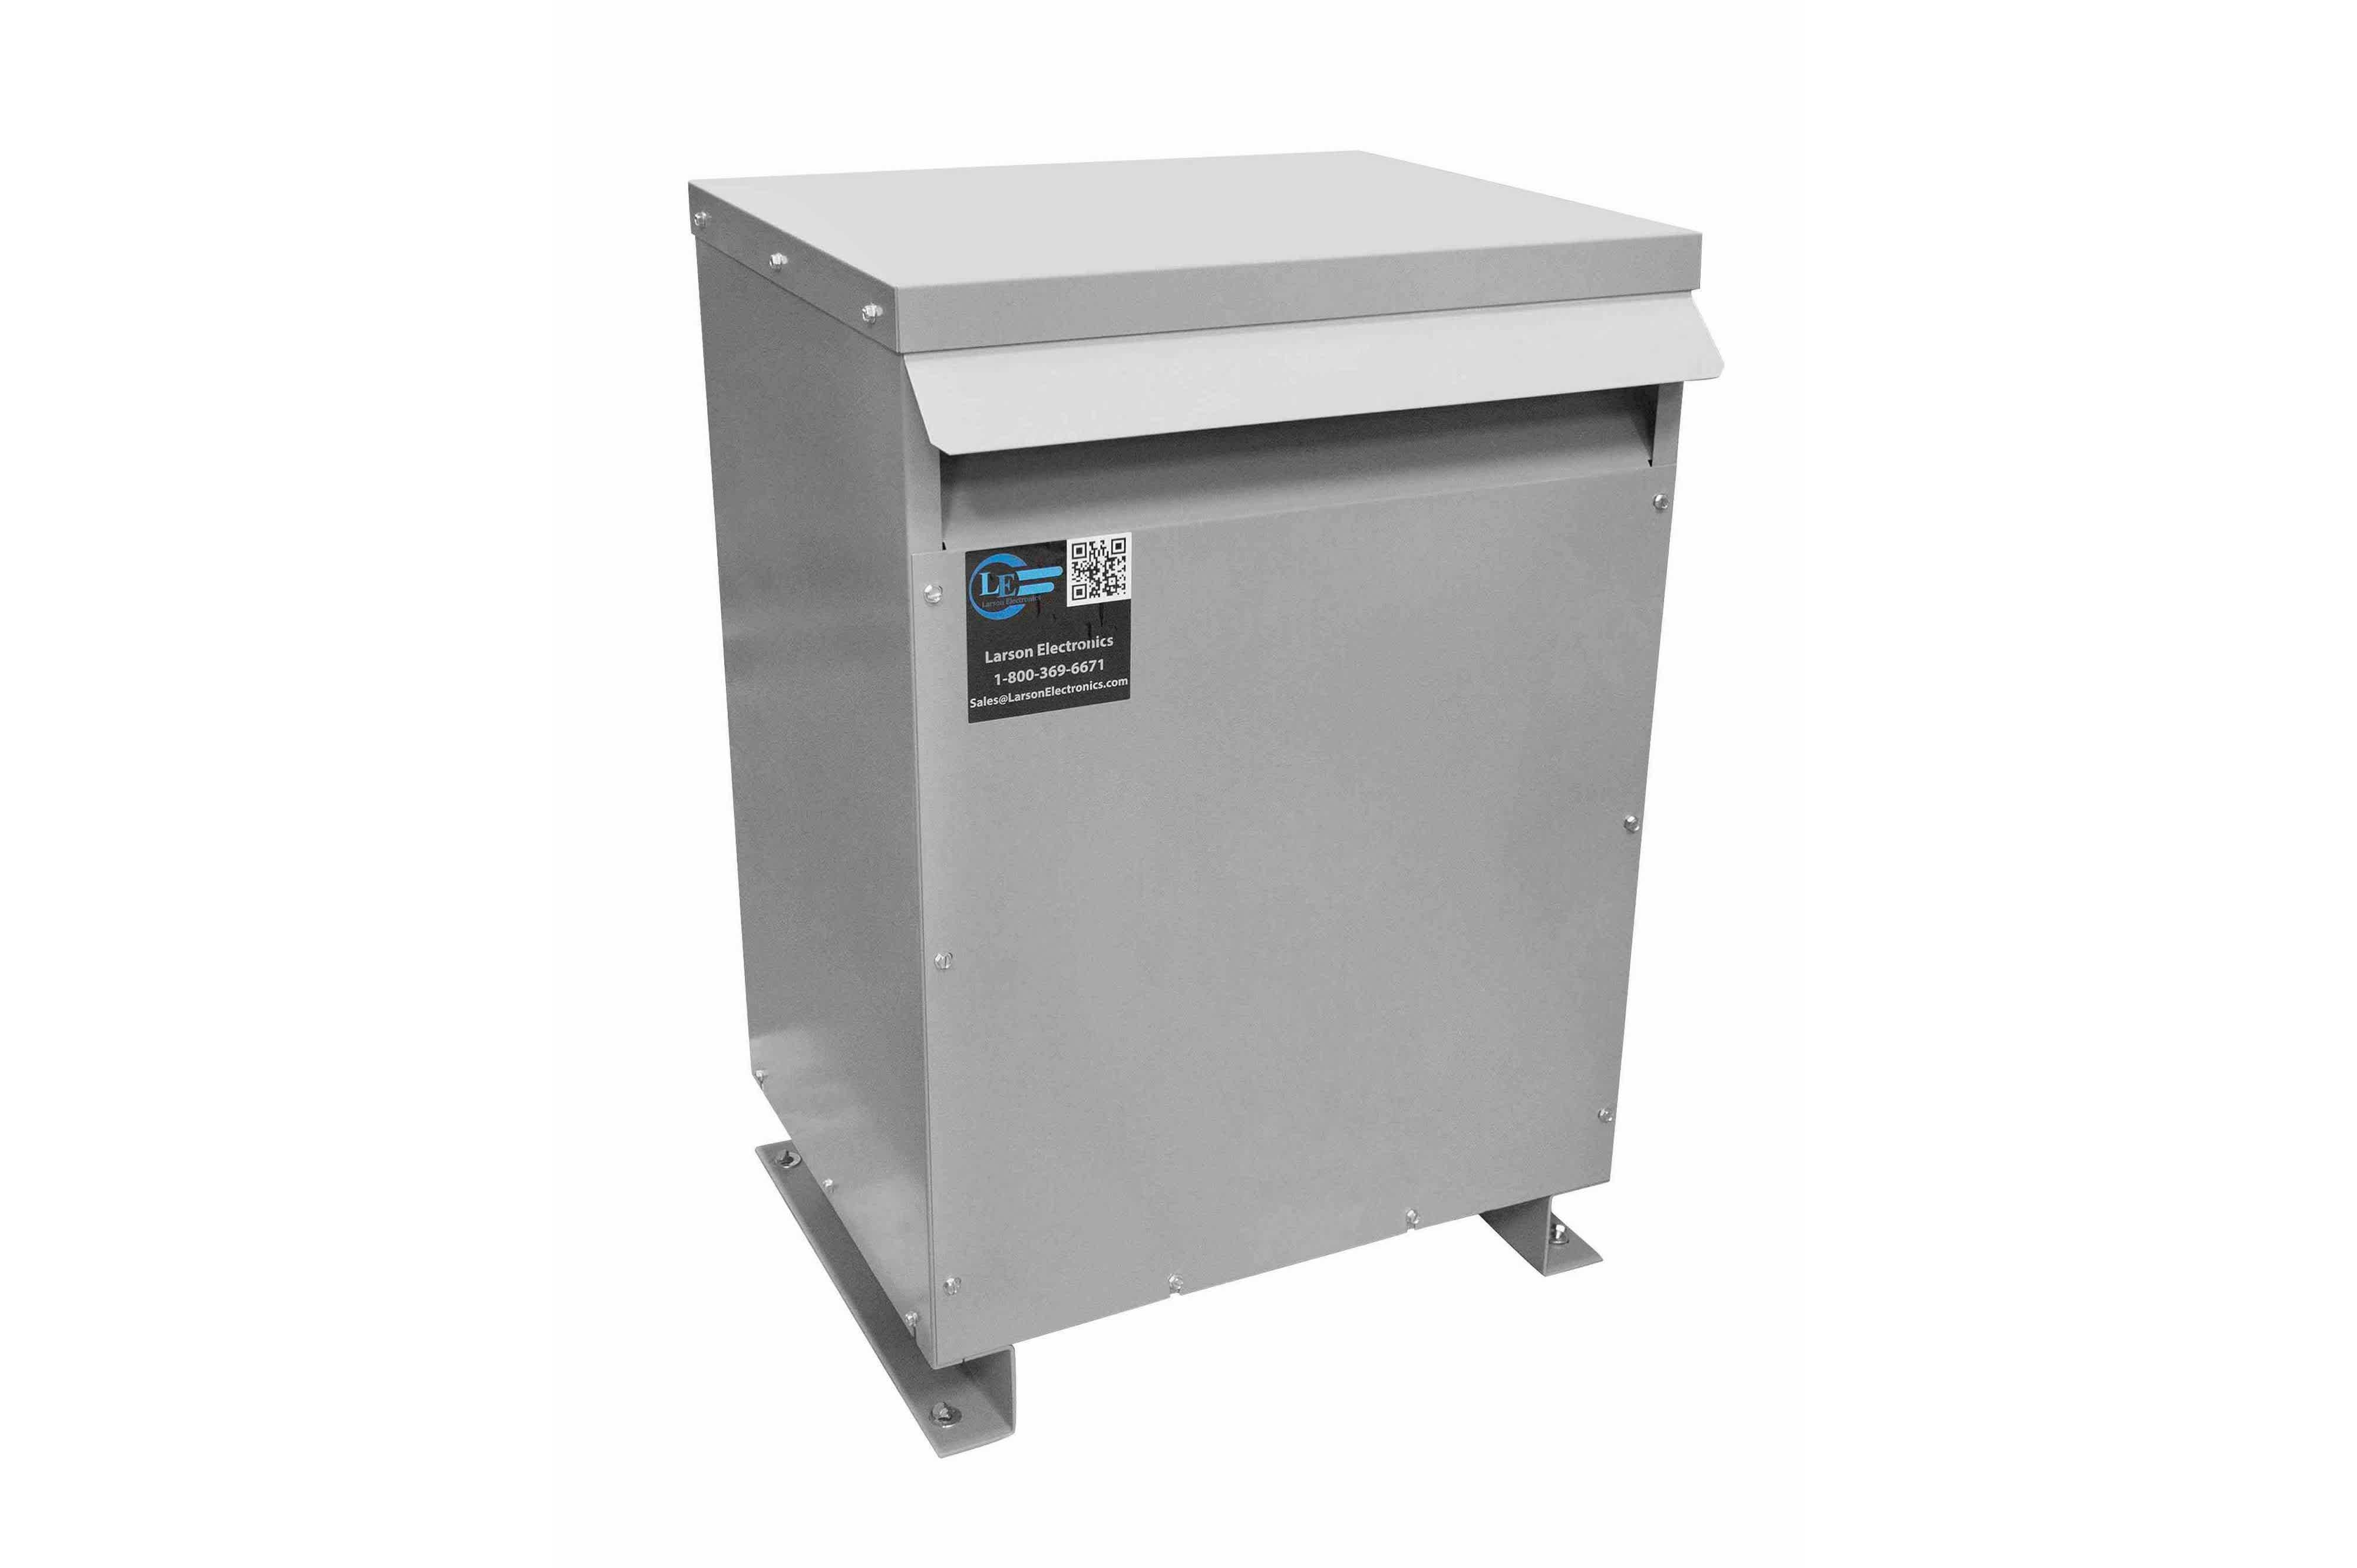 12 kVA 3PH Isolation Transformer, 240V Wye Primary, 208V Delta Secondary, N3R, Ventilated, 60 Hz